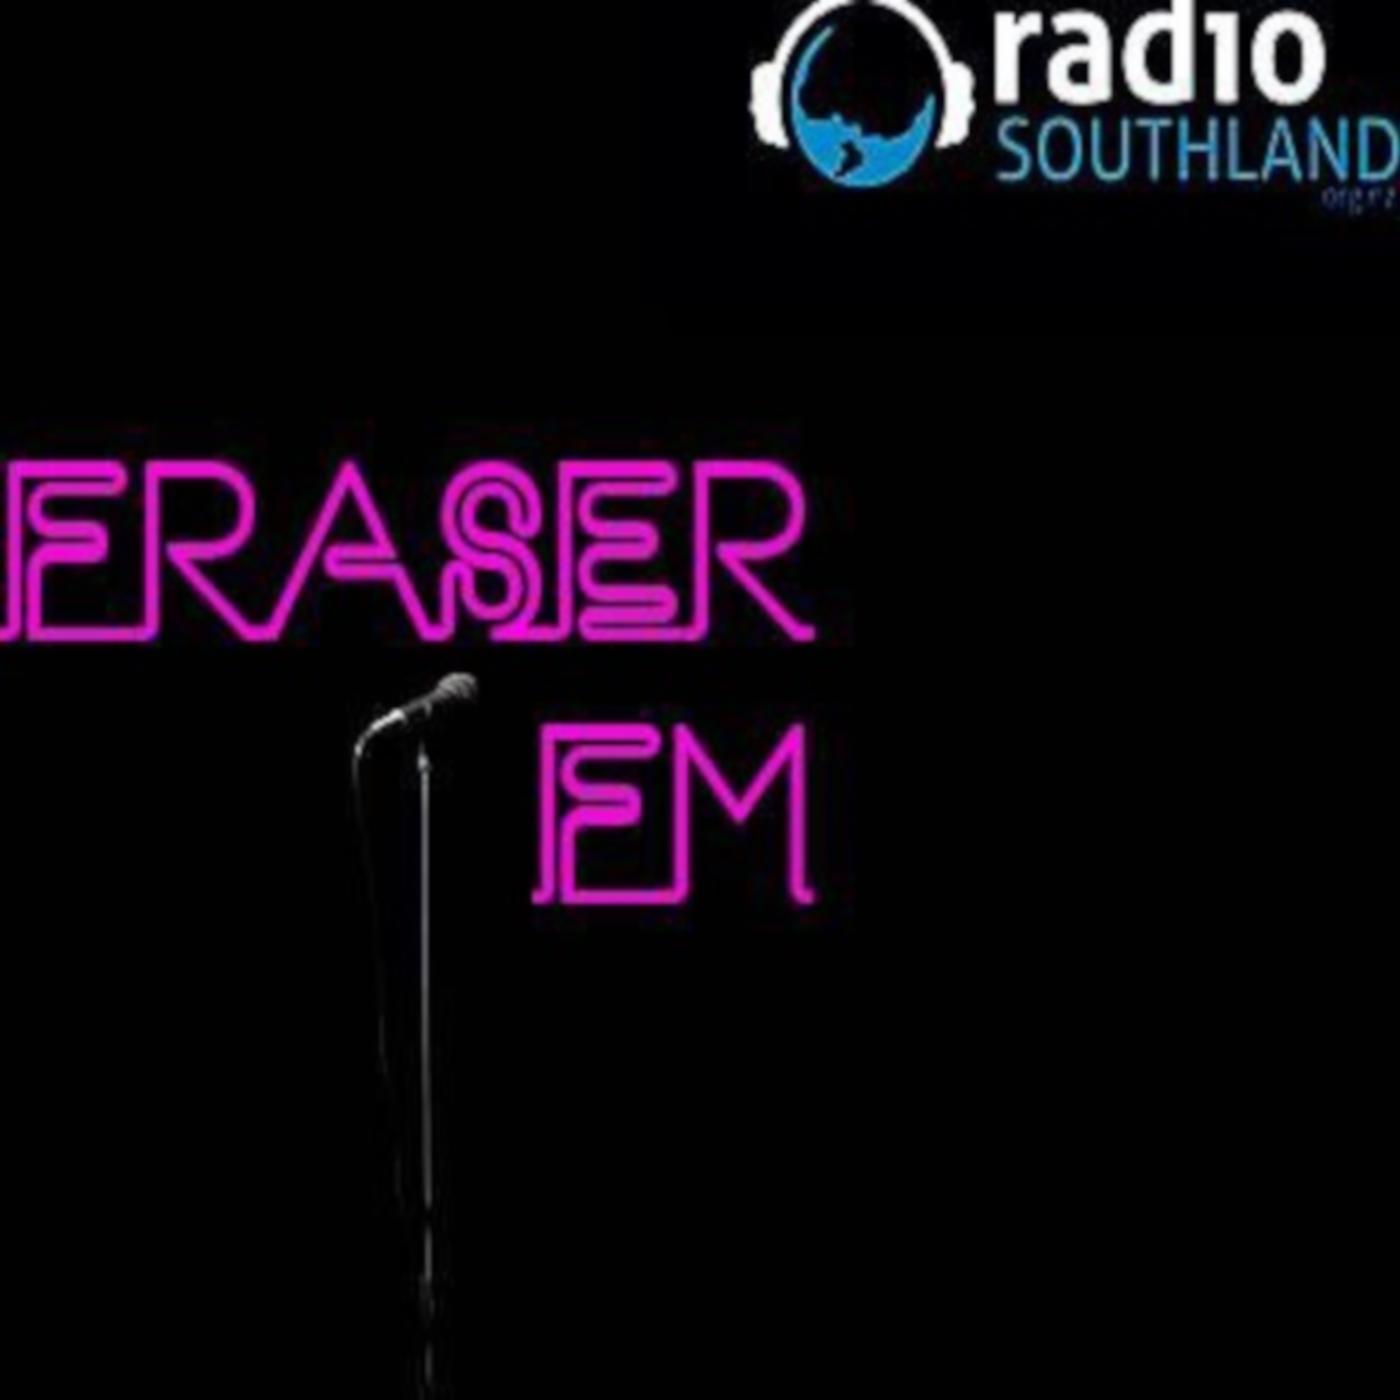 https://cdn.accessradio.org/StationFolder/radiosouthland/Images/FraserFM.png